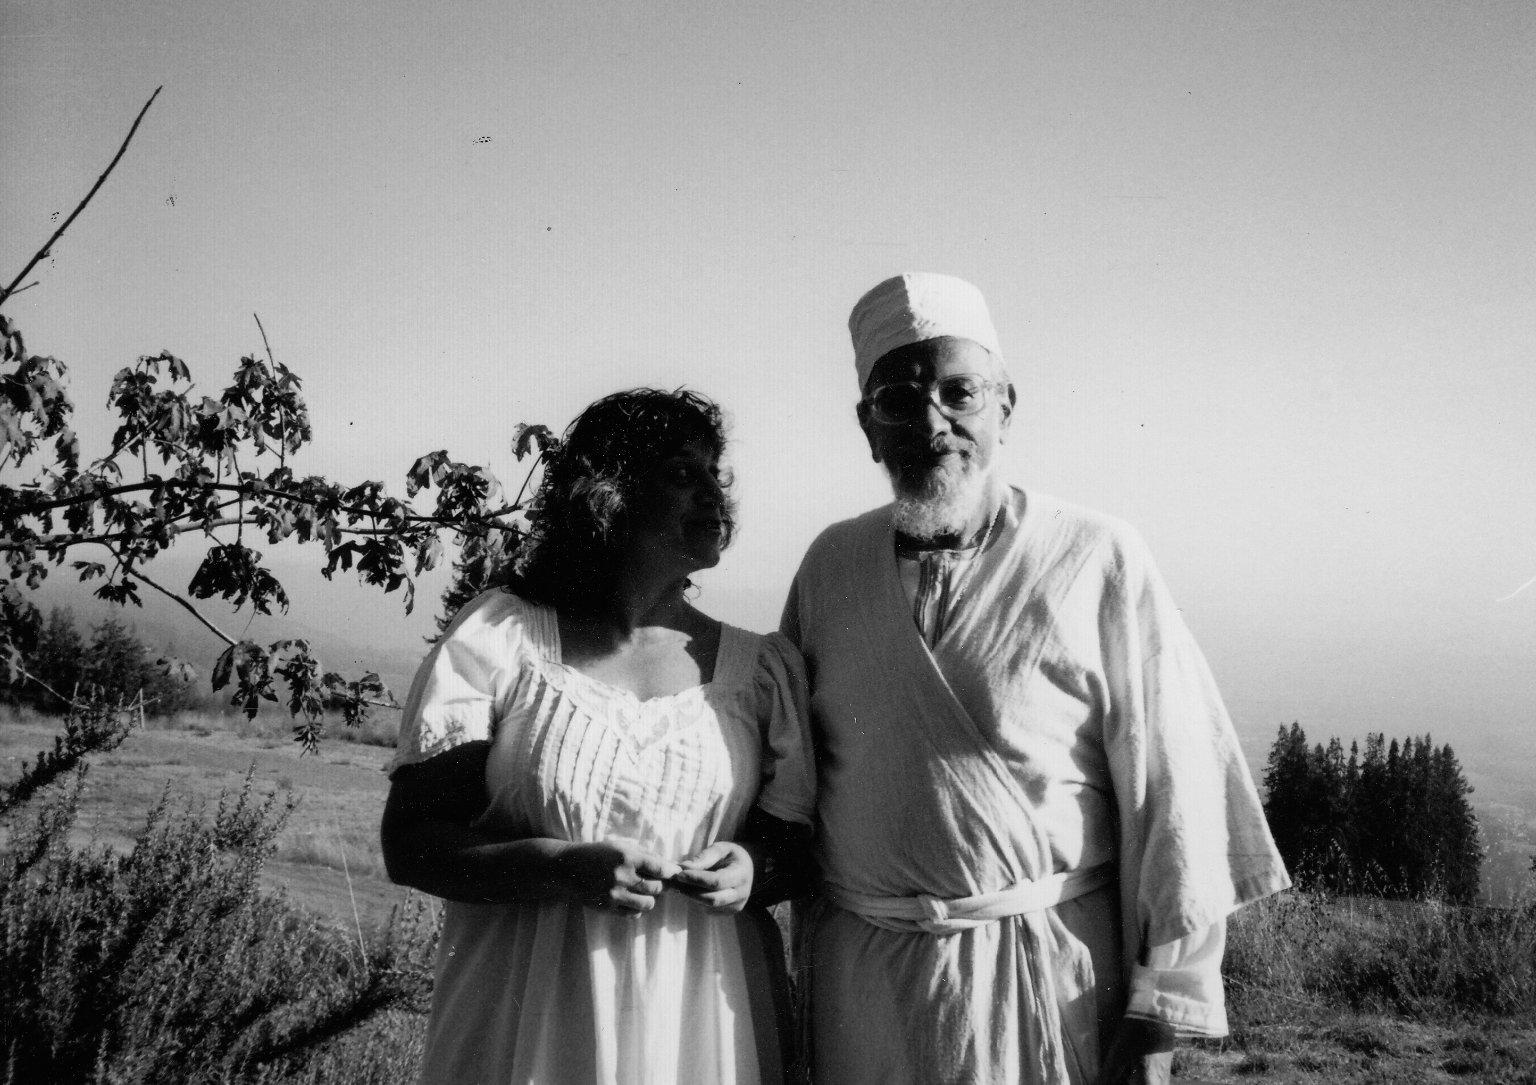 Rabbi Zalman Schachter-Shalomi and his partner, Eve Ilsen, on Mount Madonna during High Holidays, 1988.